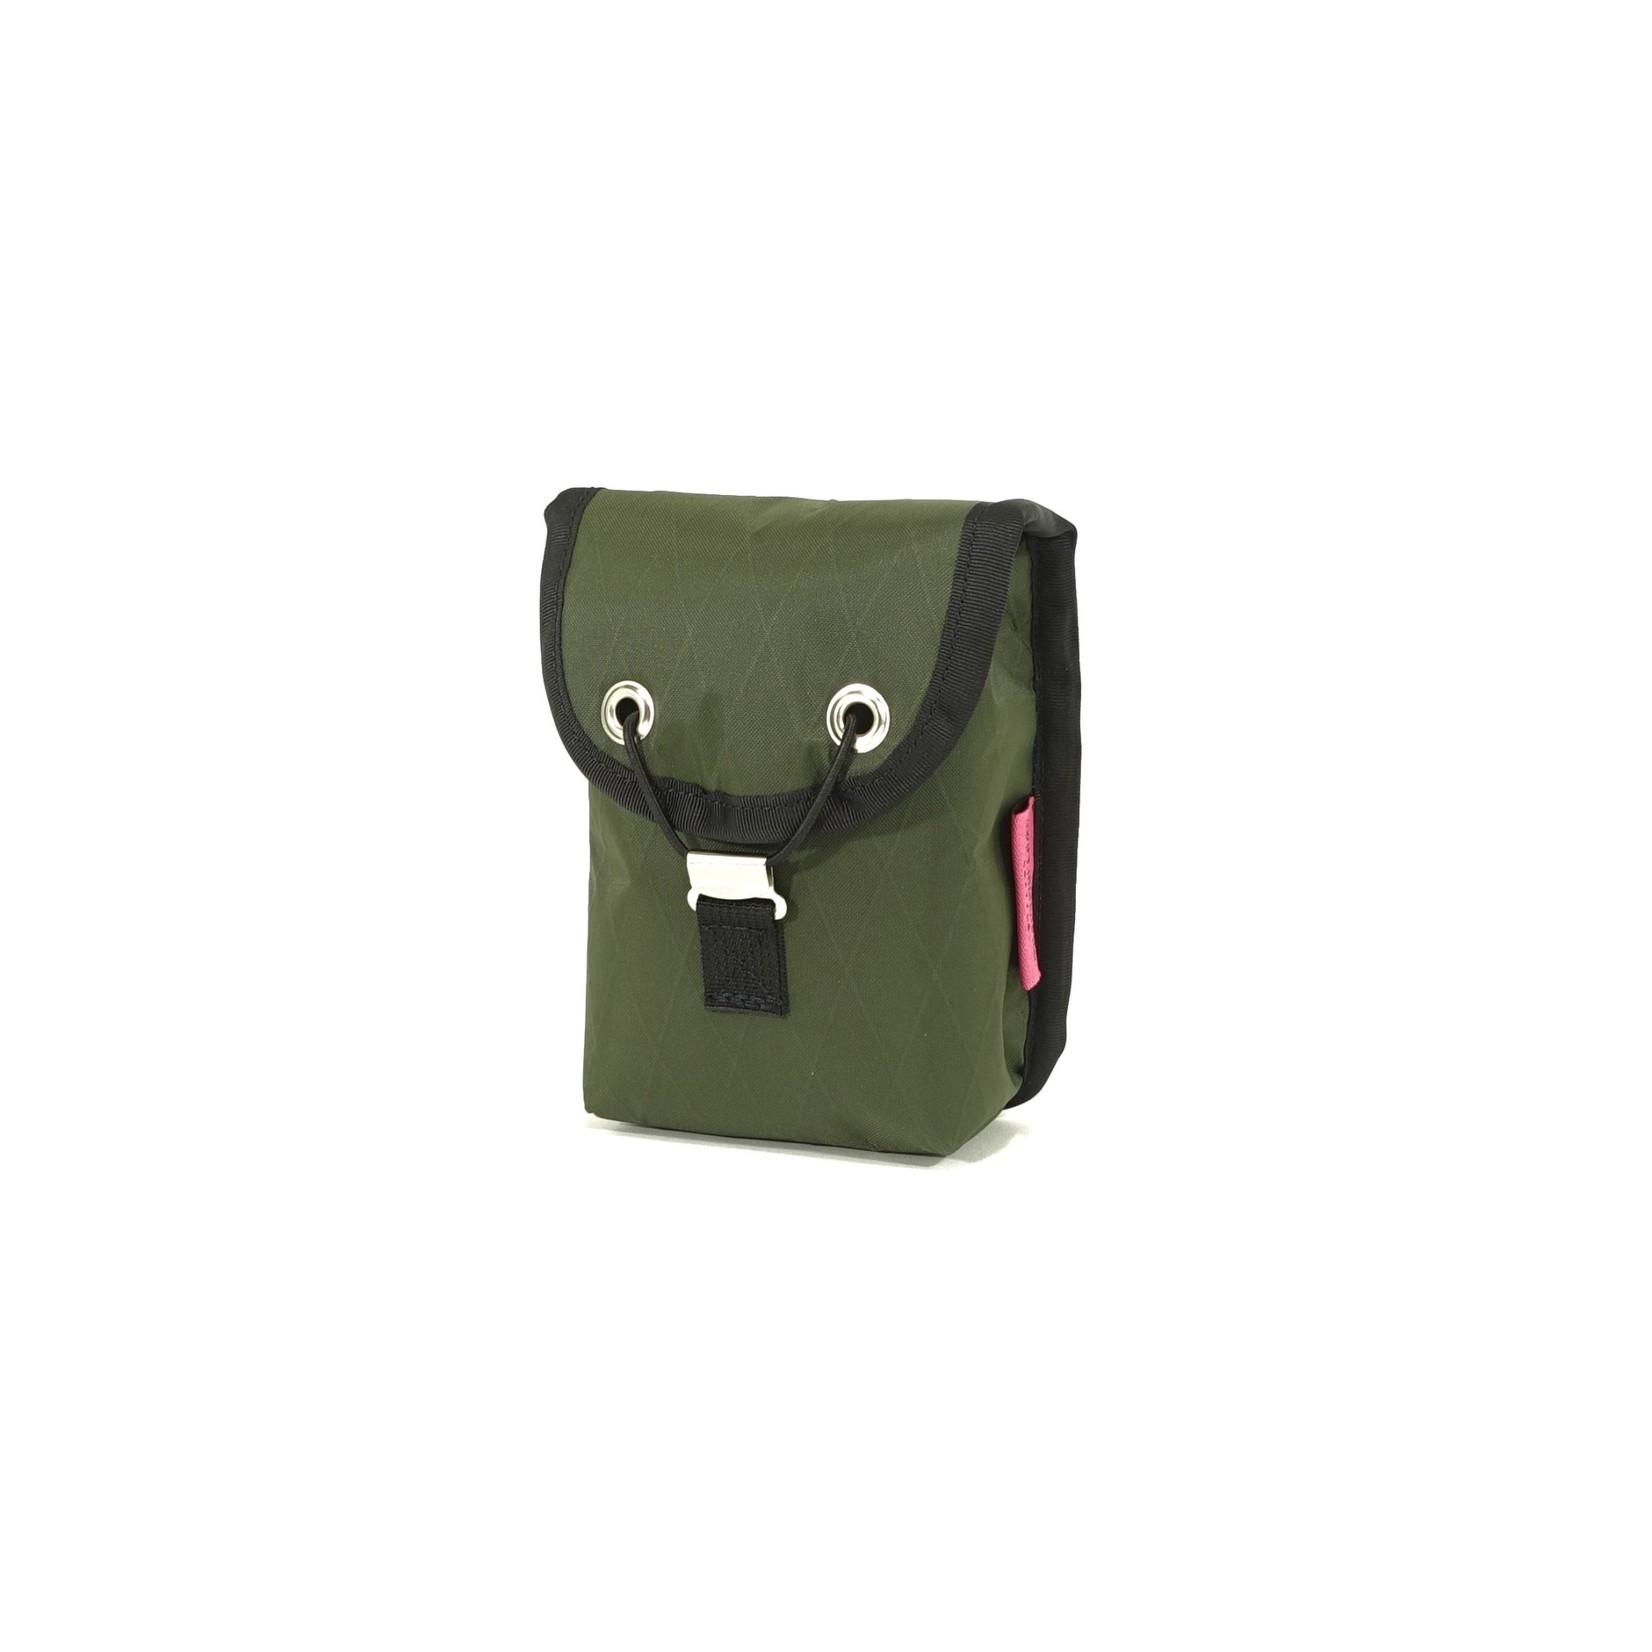 Swift Industries Swift Industries Rando Pocket Dk Green